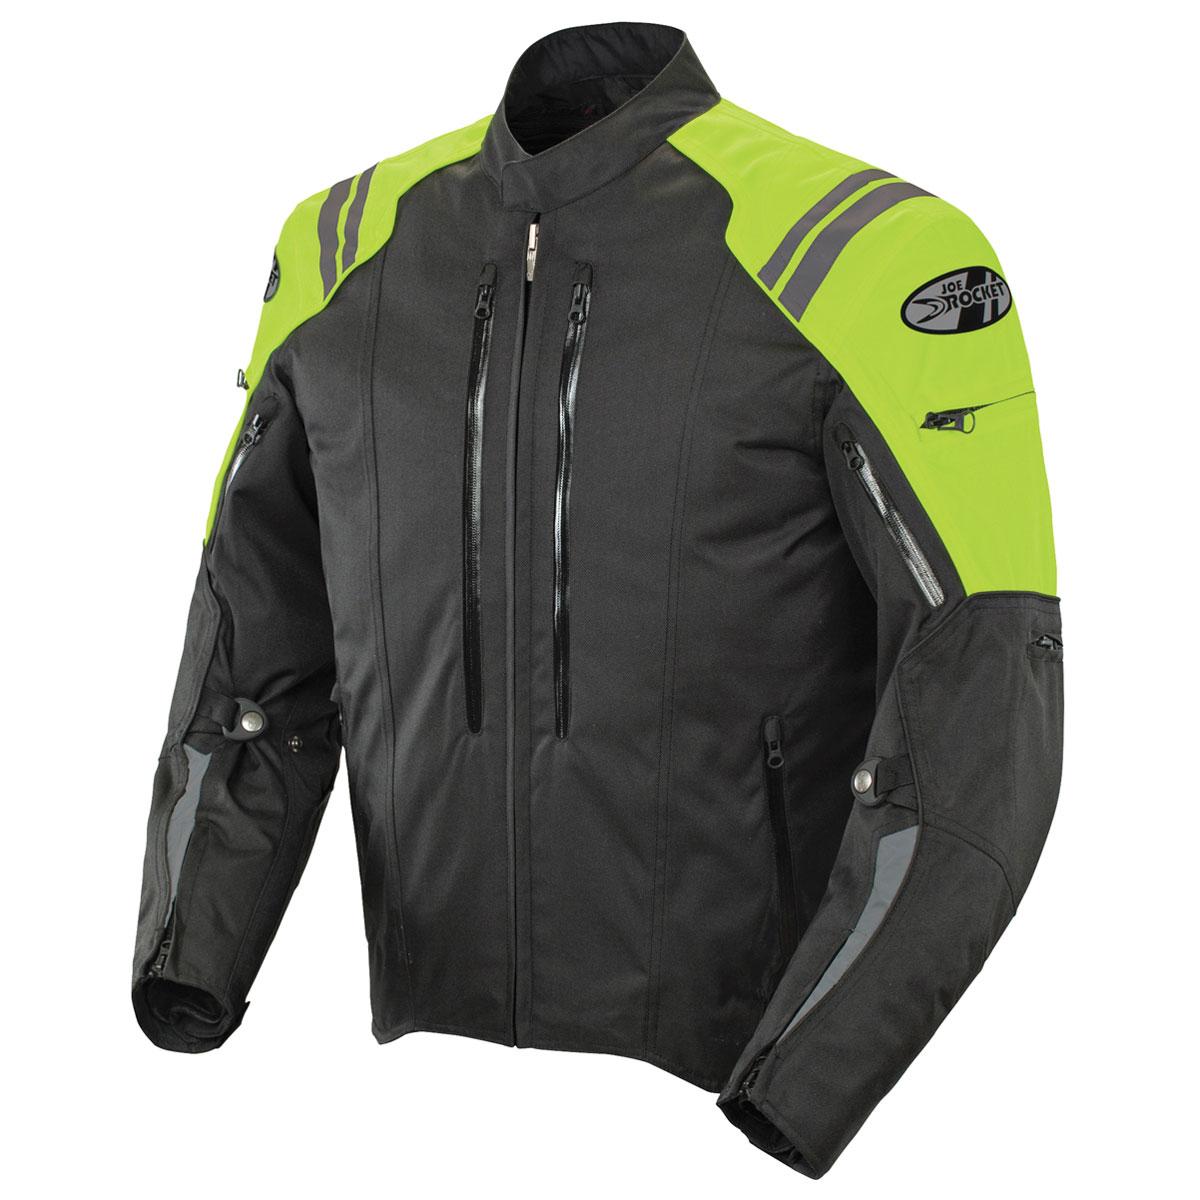 Joe Rocket Men's Atomic 4.0 Waterproof Neon/Black Jacket